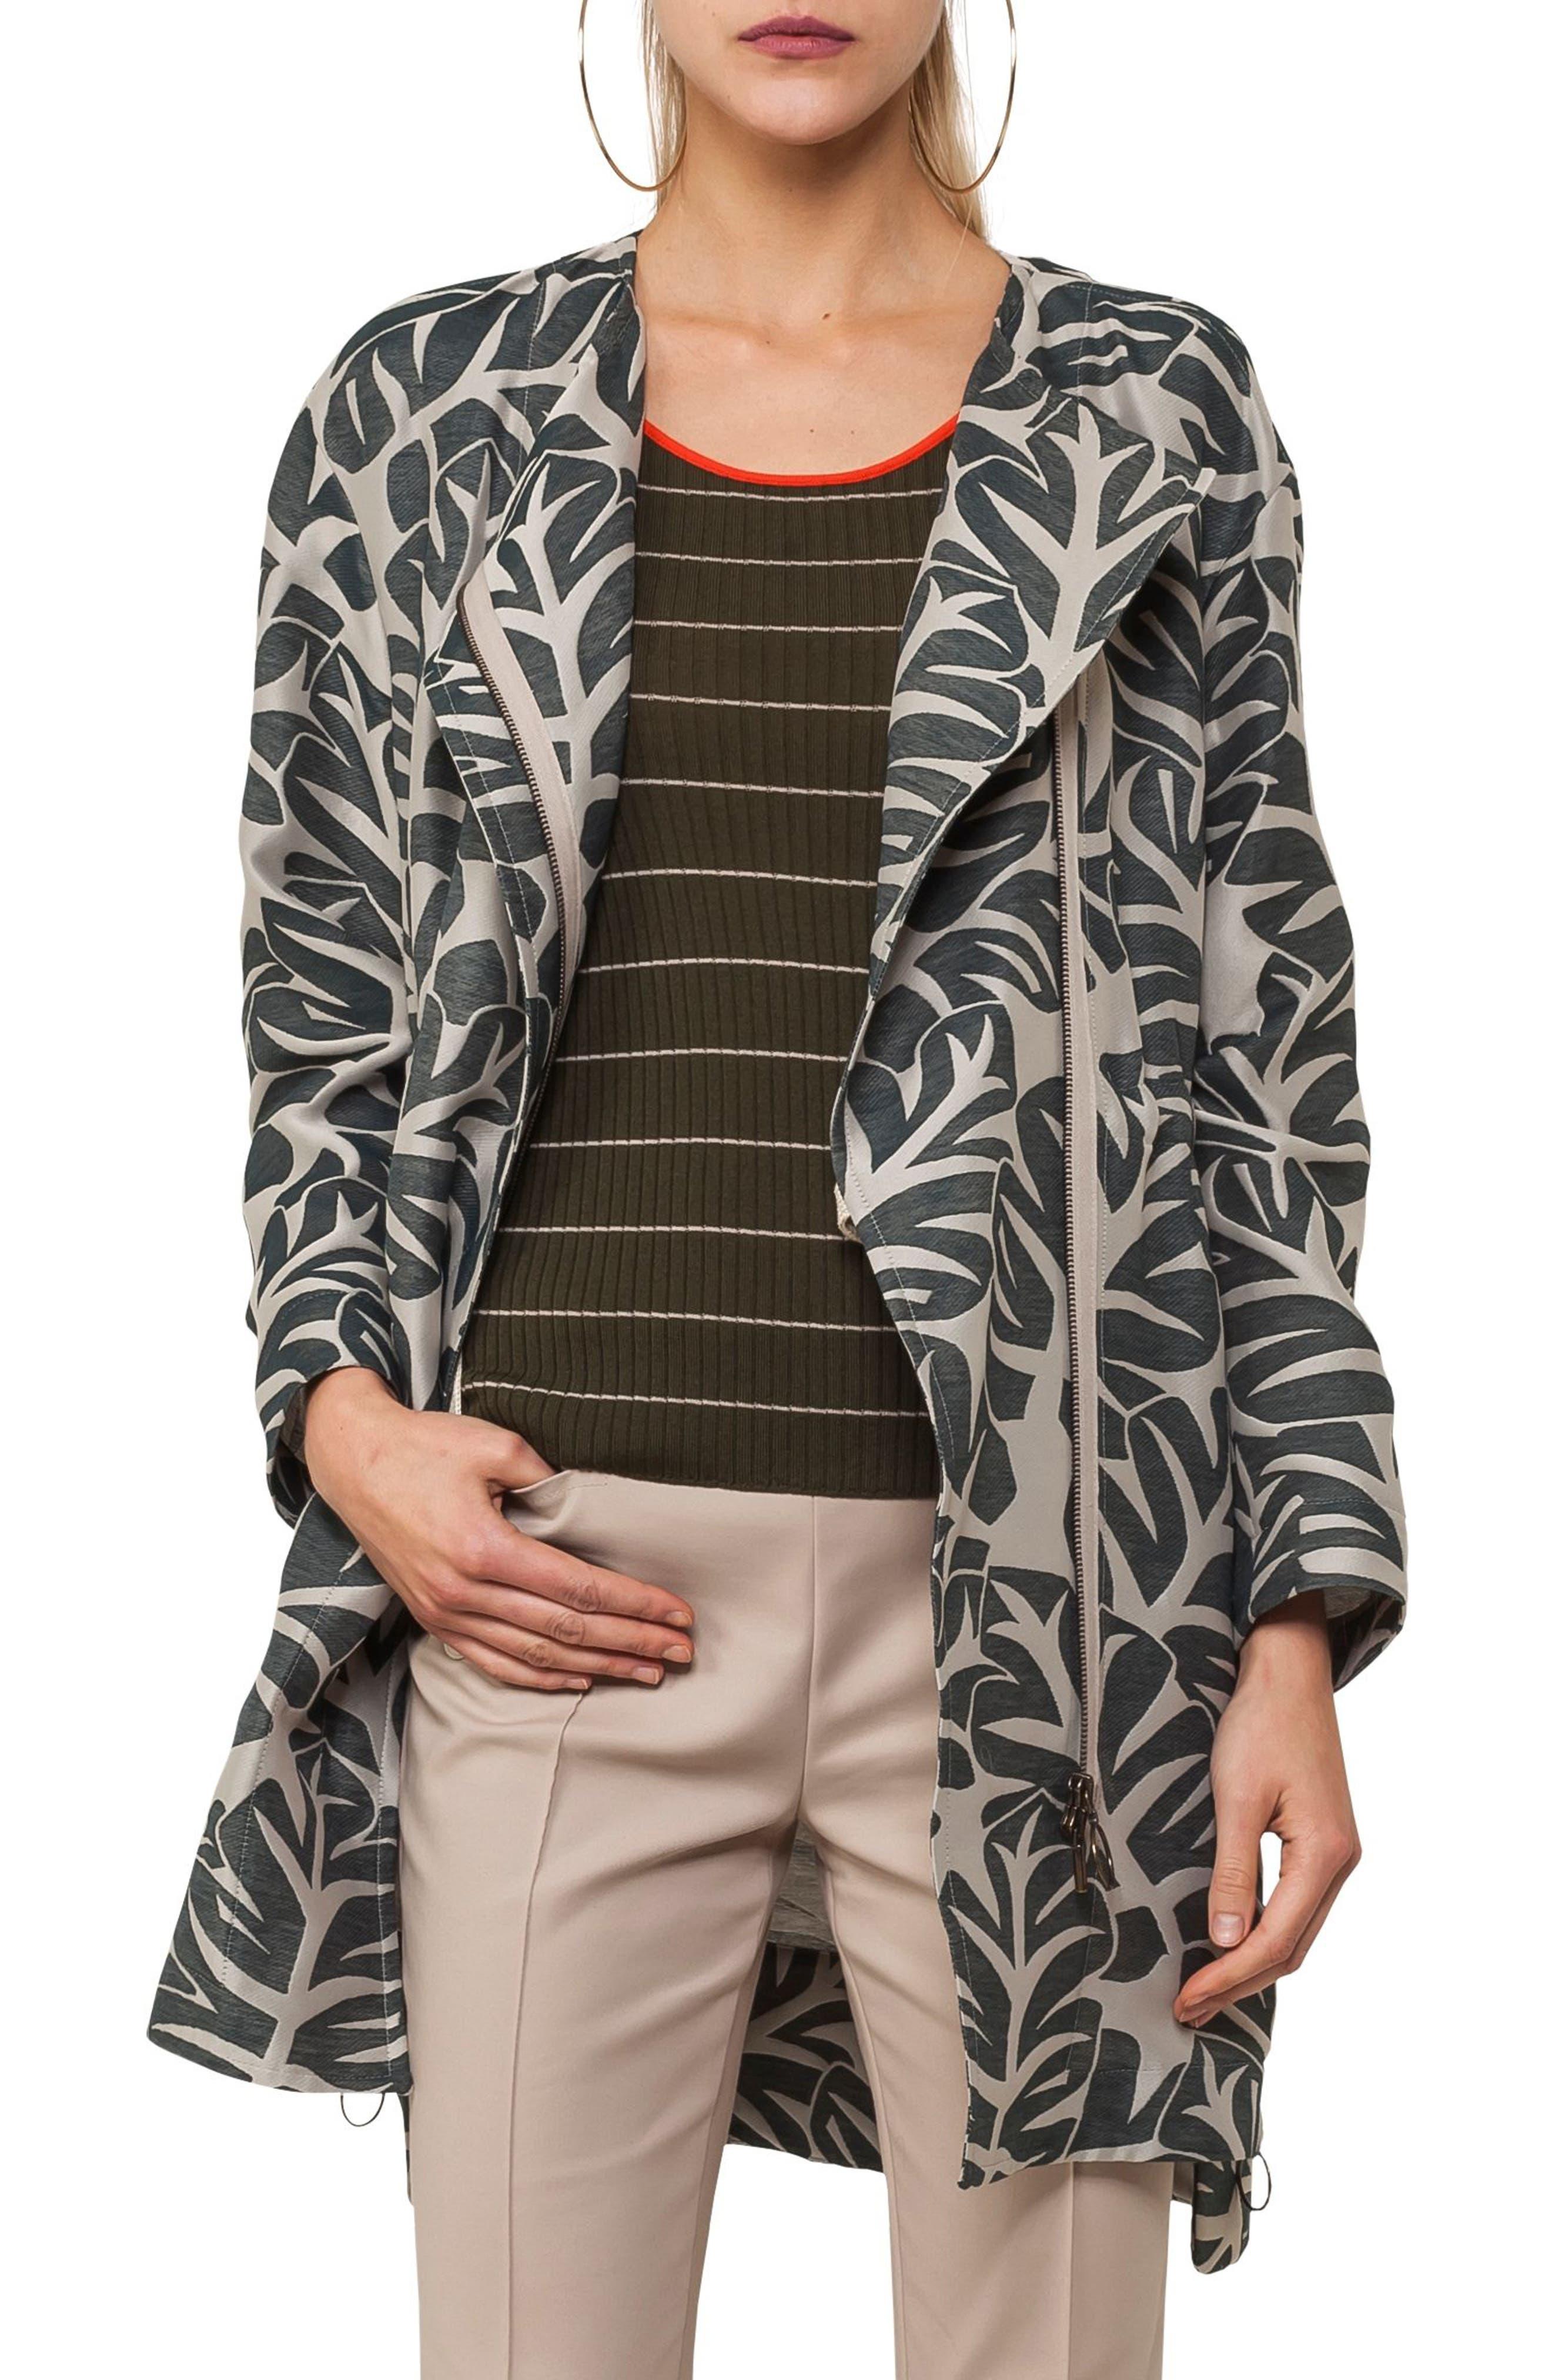 Tropical Leaf Jacquard Coat,                         Main,                         color, Sand / Avocado